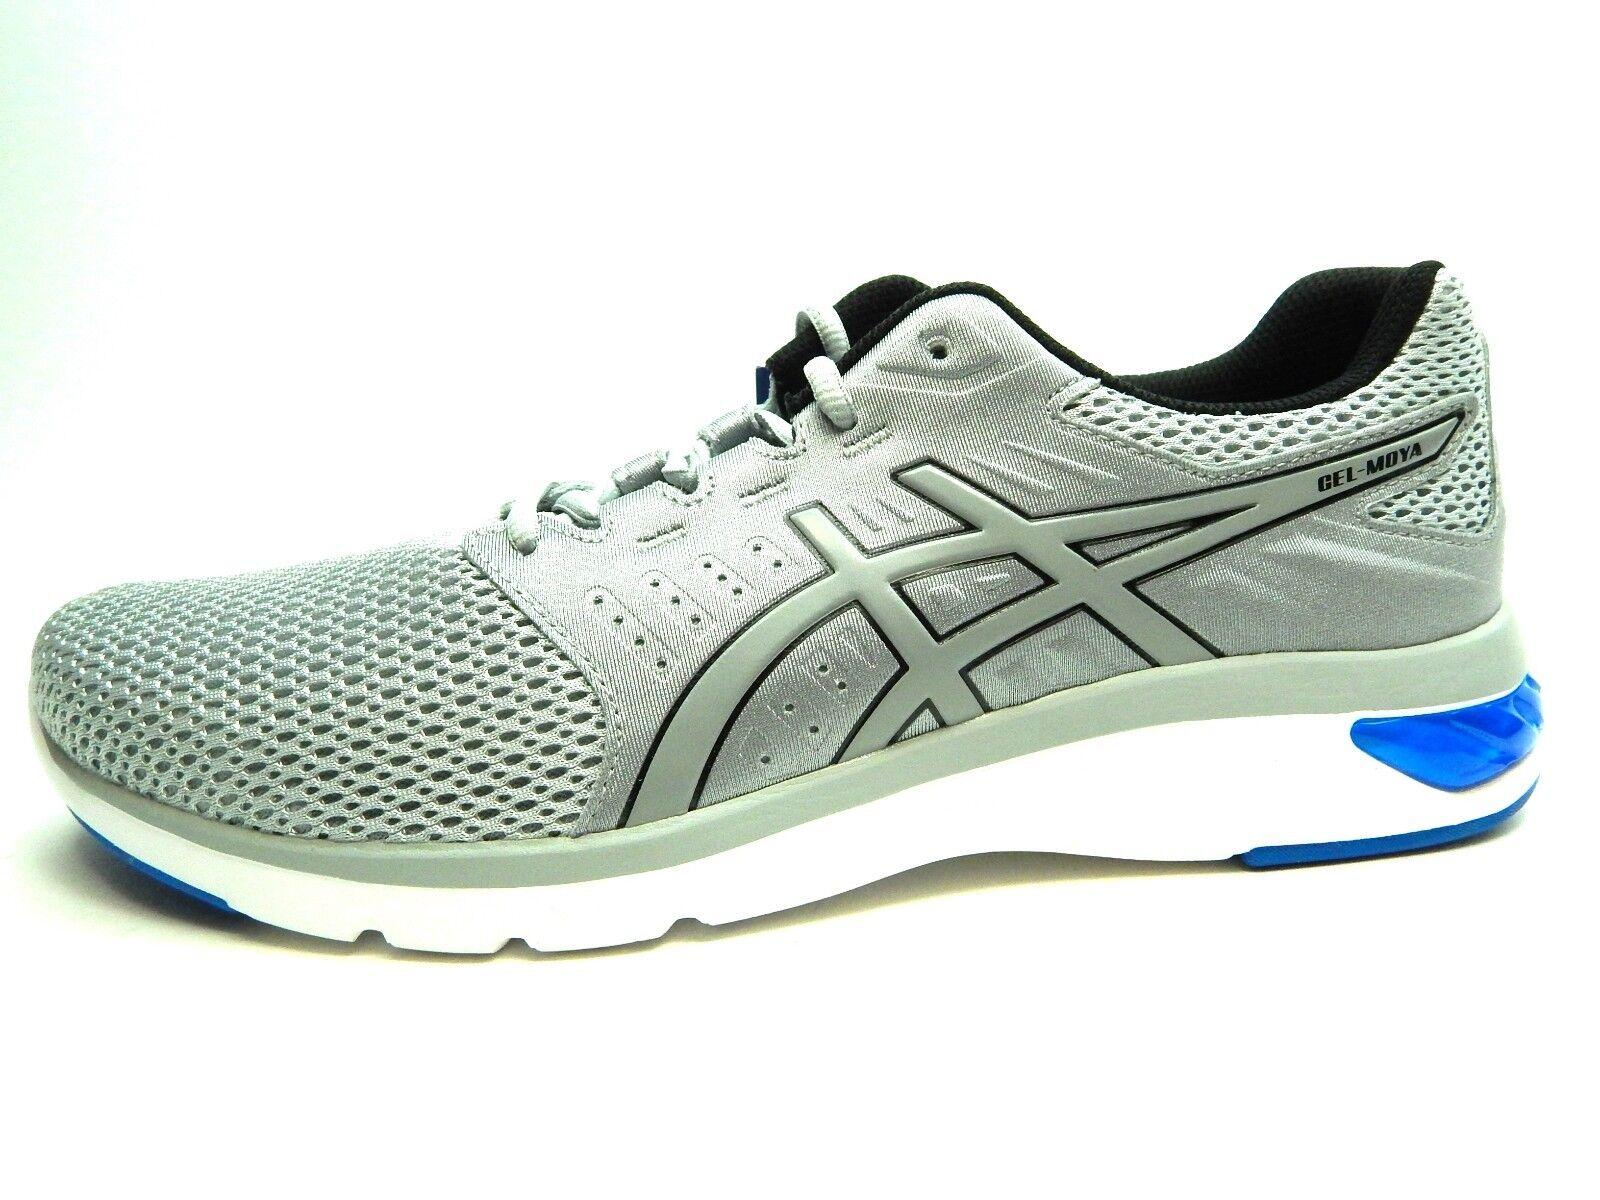 ASICS GEL MOYA T841N 9696 MID grigio VICTORIA blu MEN scarpe